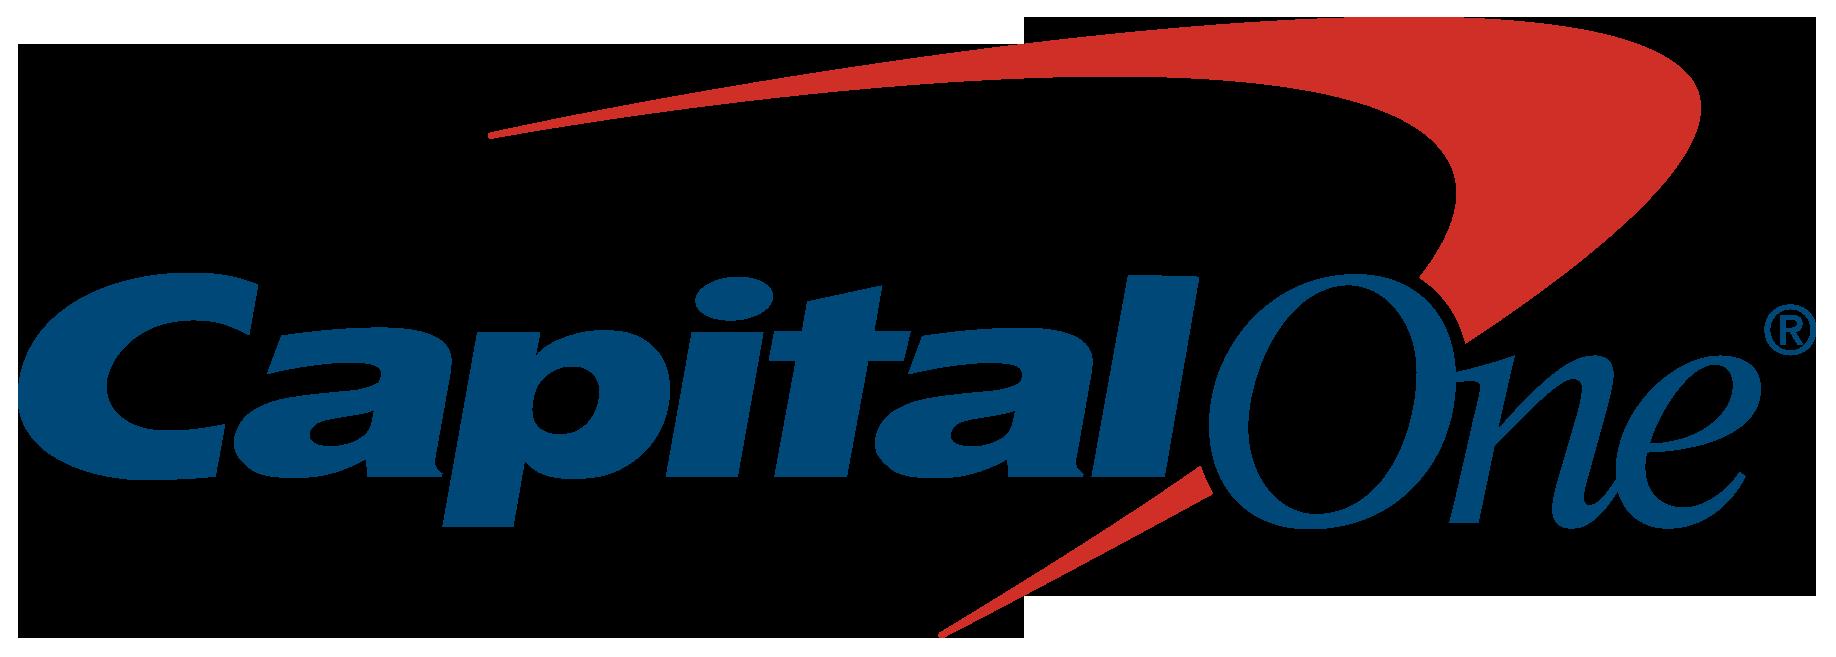 capital.